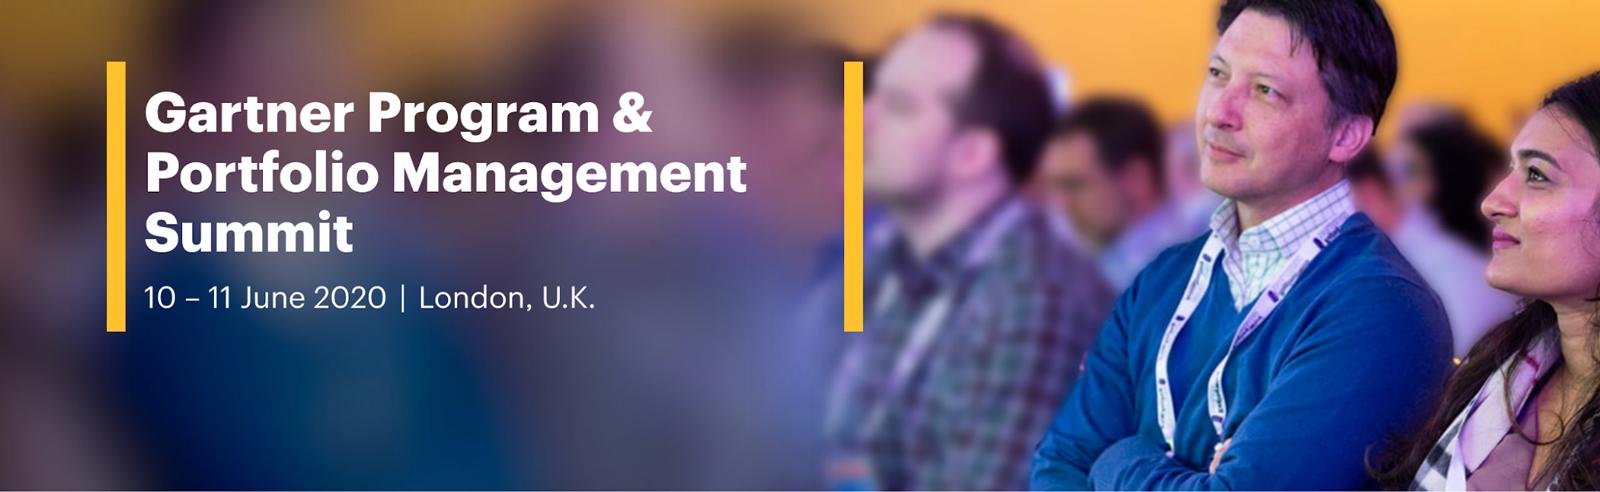 Gartner Program & Portfolio Management Summit